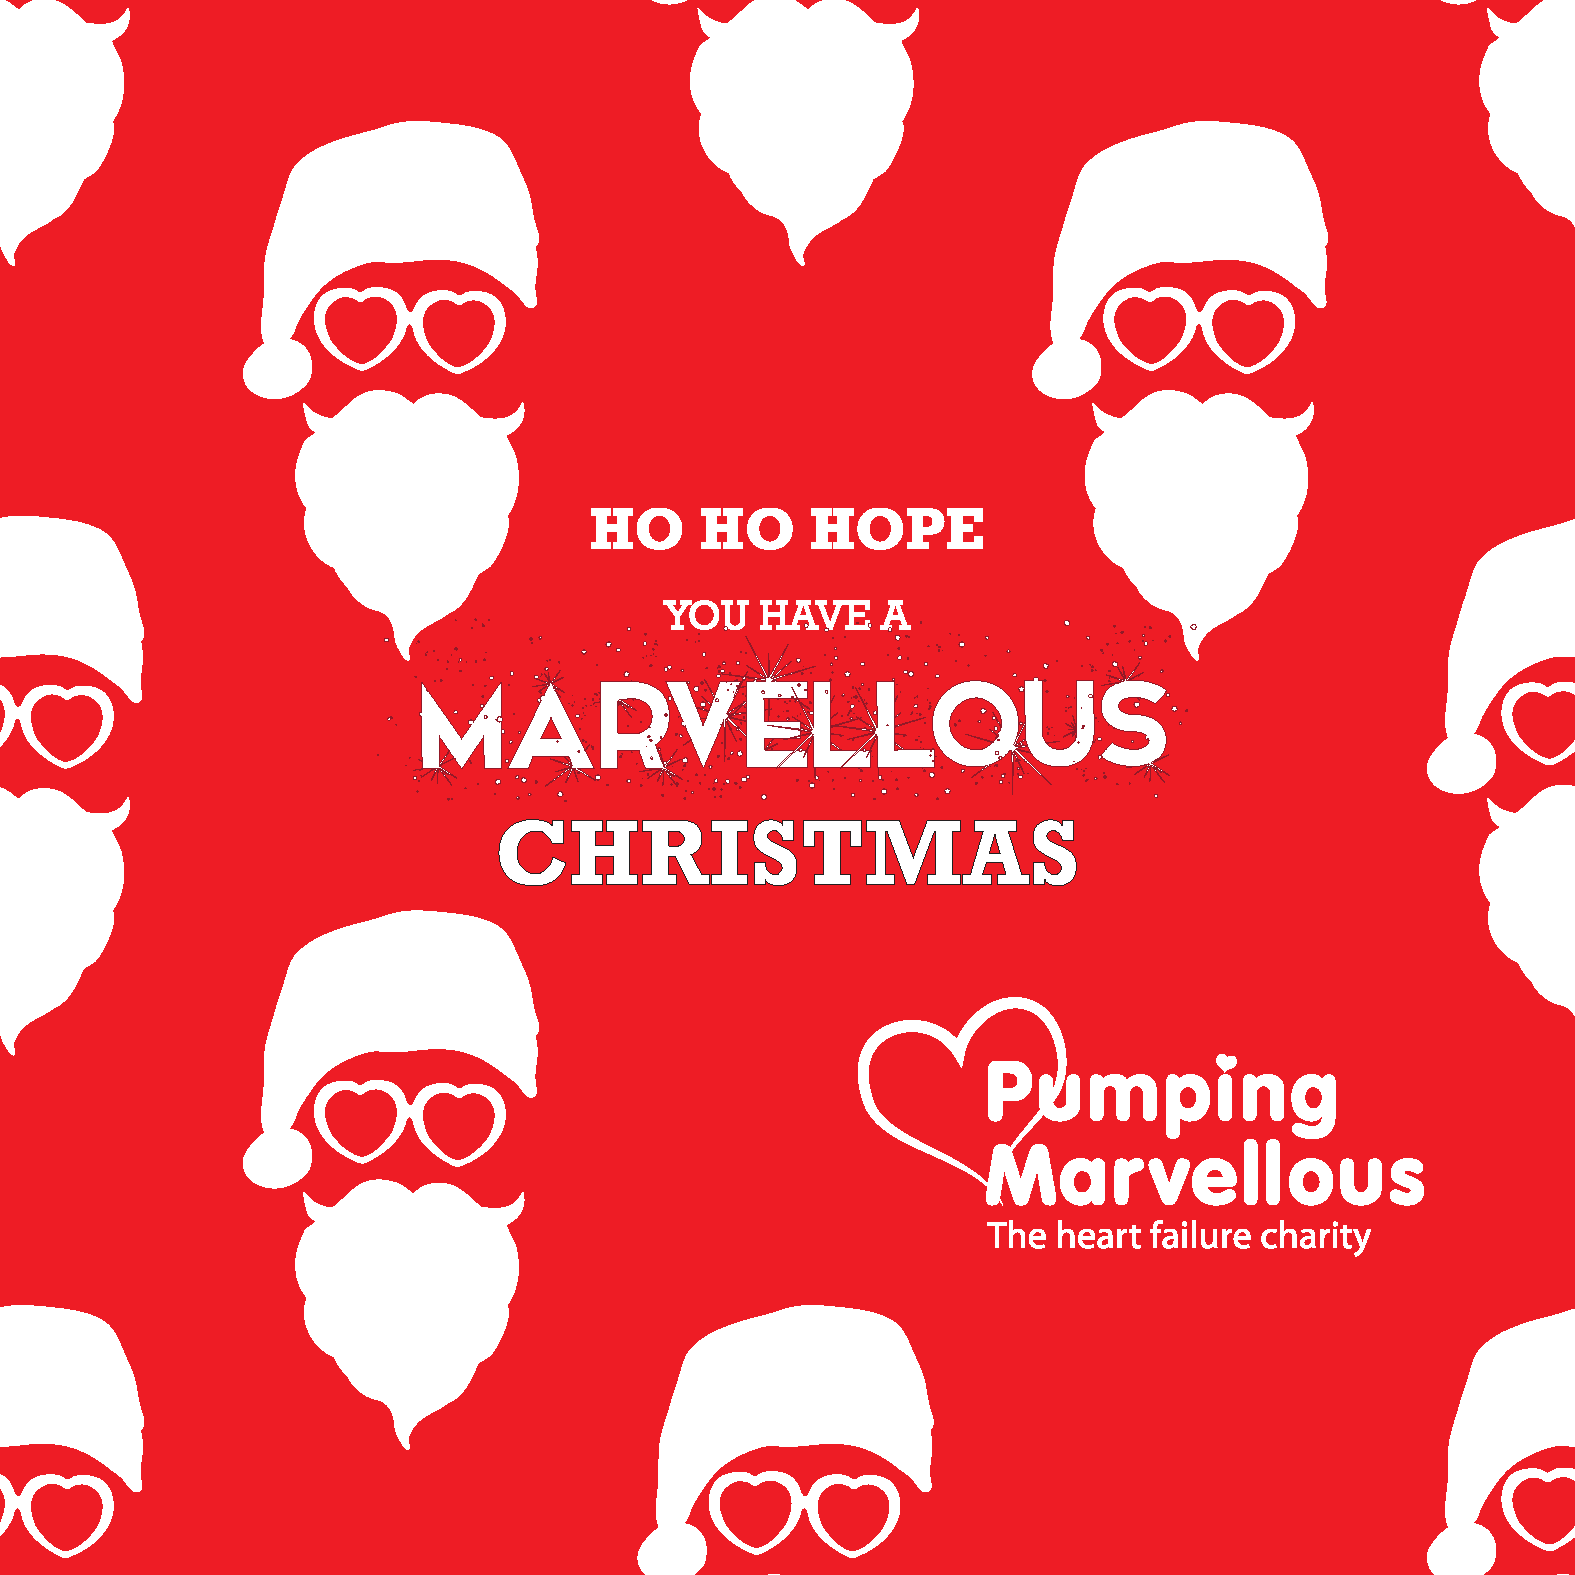 Pumping Marvellous Foundation